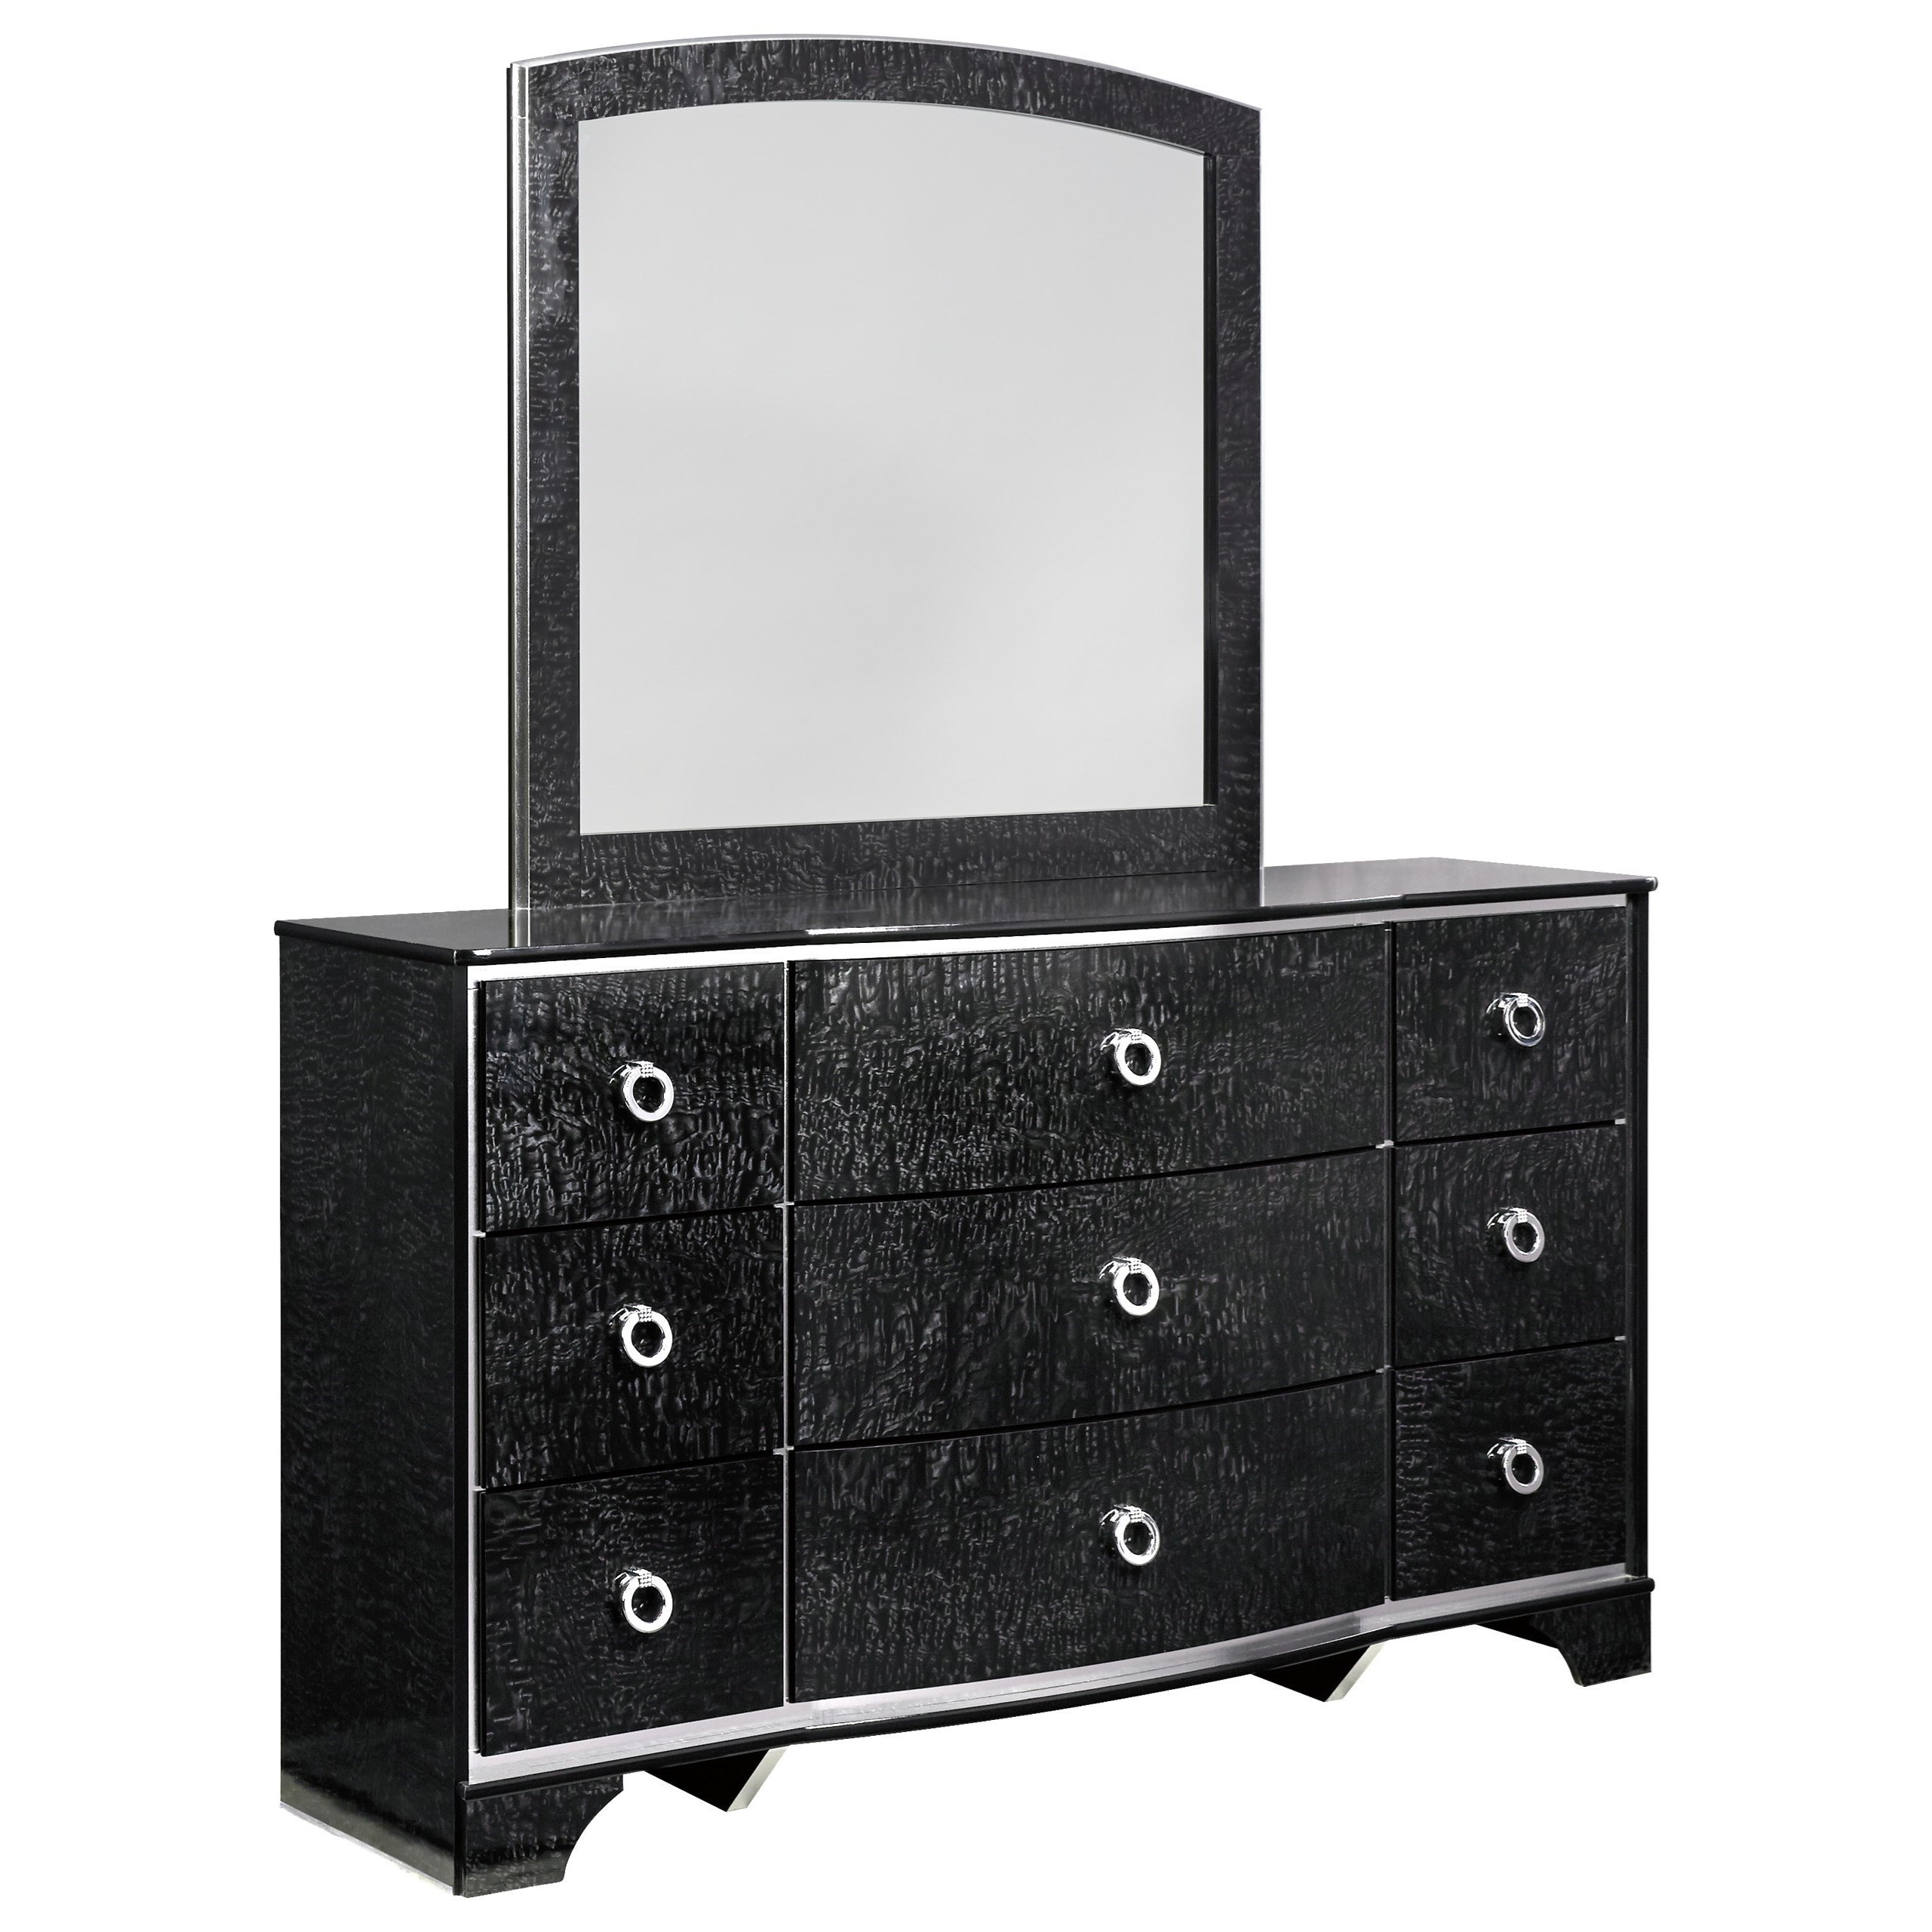 Signature Design by Ashley Amrothi Dresser & Bedroom Mirror - Item Number: B257-31+36